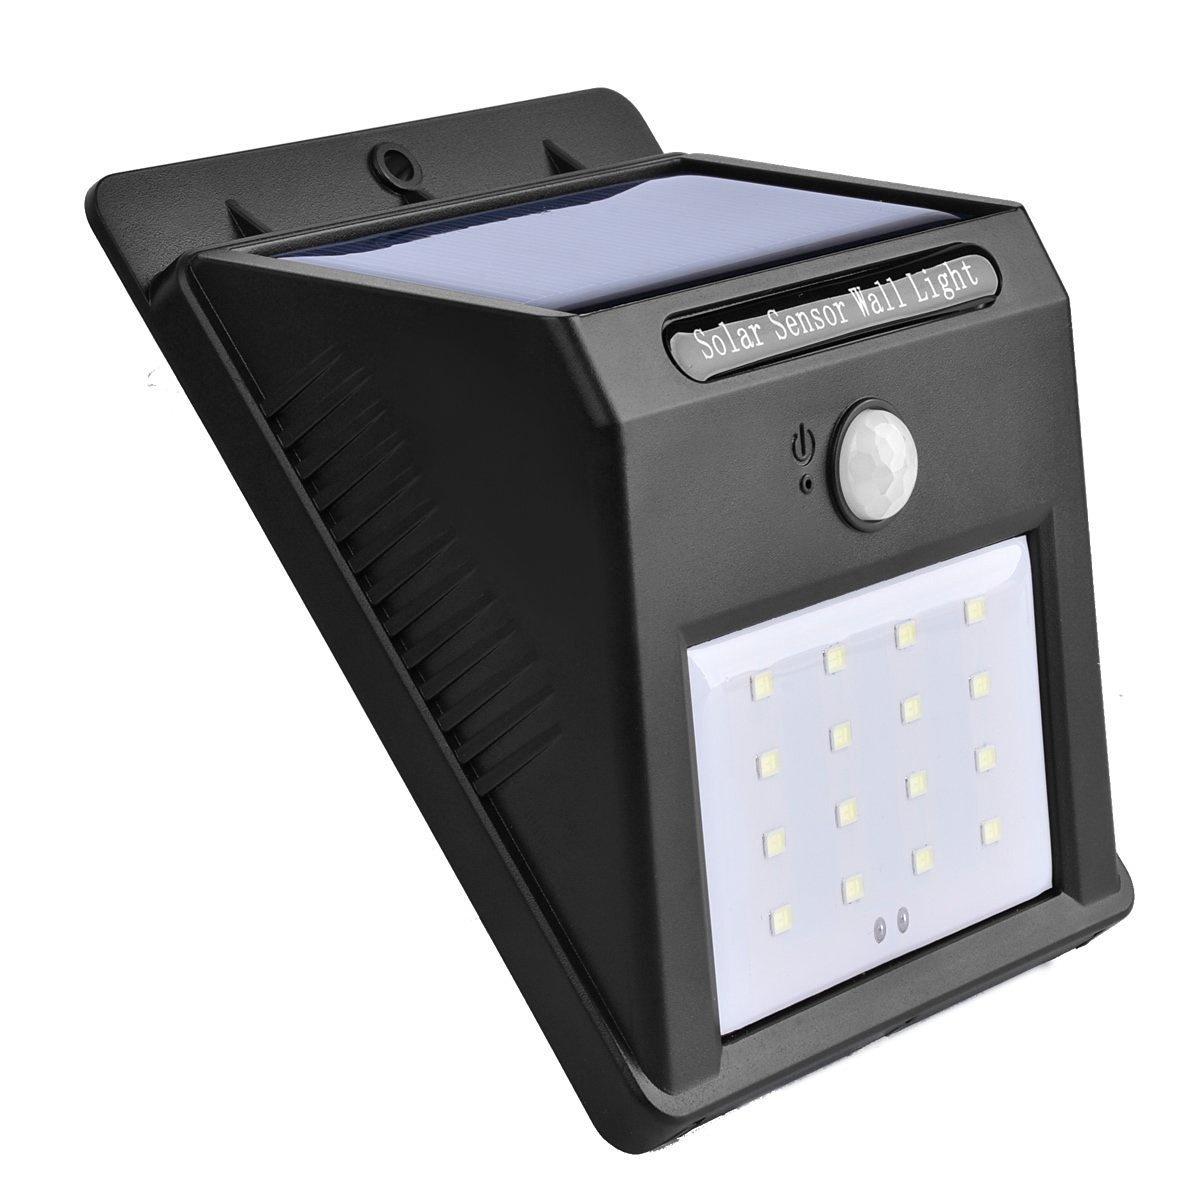 Solar-Lights-Outdoor-Solar-Lights-Outdoor-16-LED-Waterproof-Security